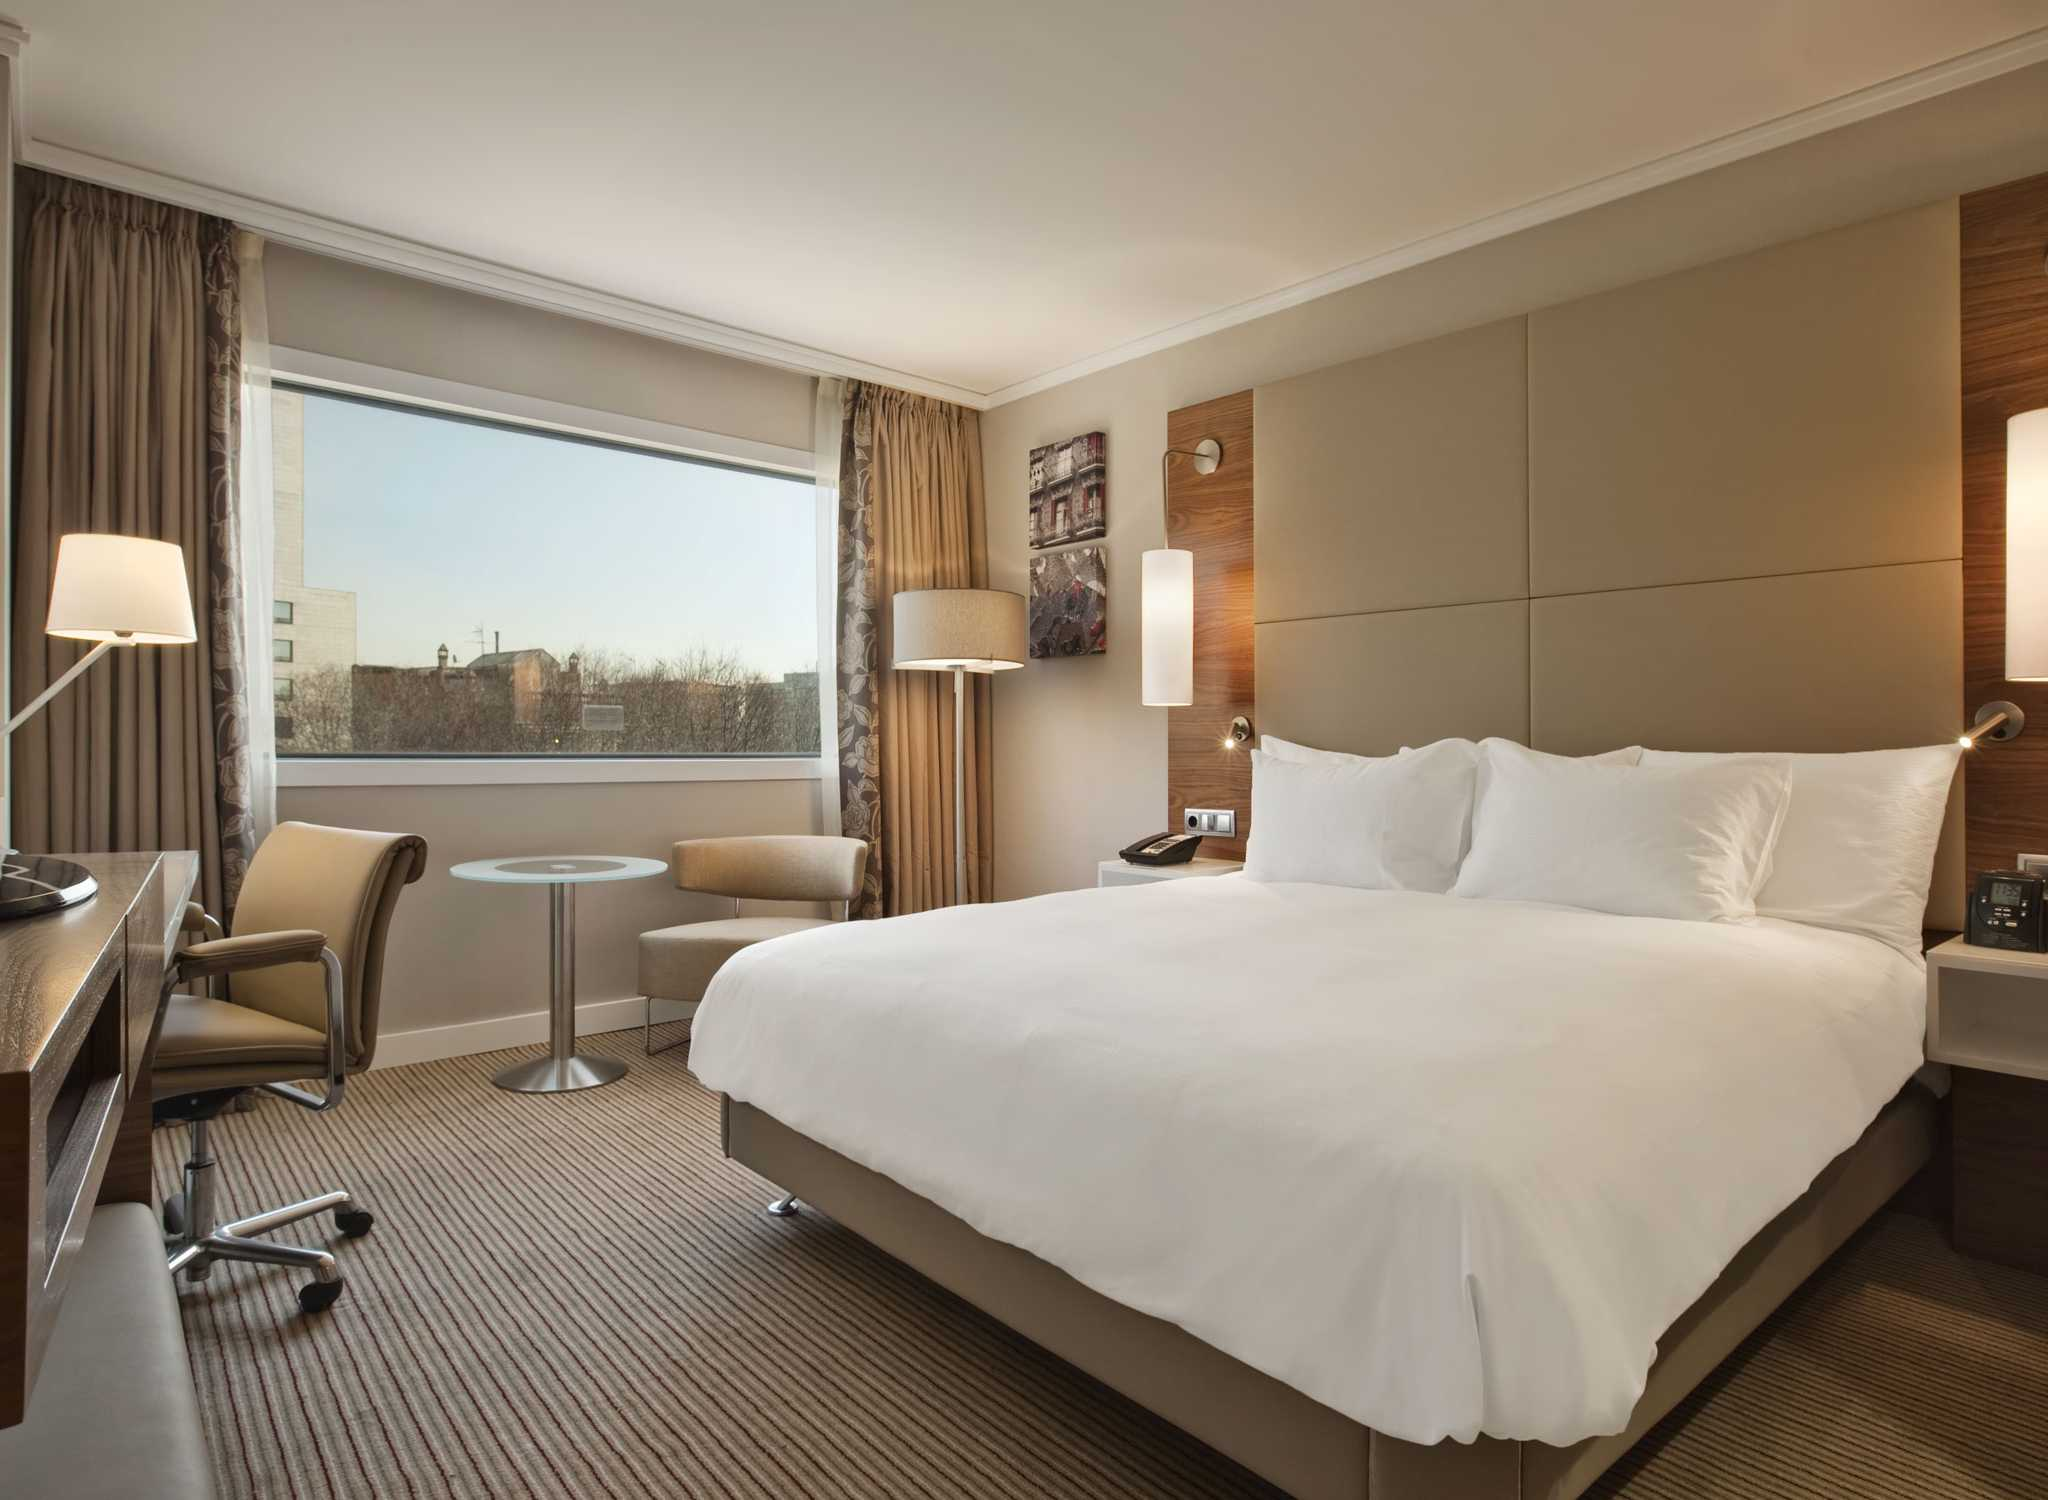 Hoteles en espa a barcelona madrid mallorca hilton for Hoteles con habitaciones familiares en espana